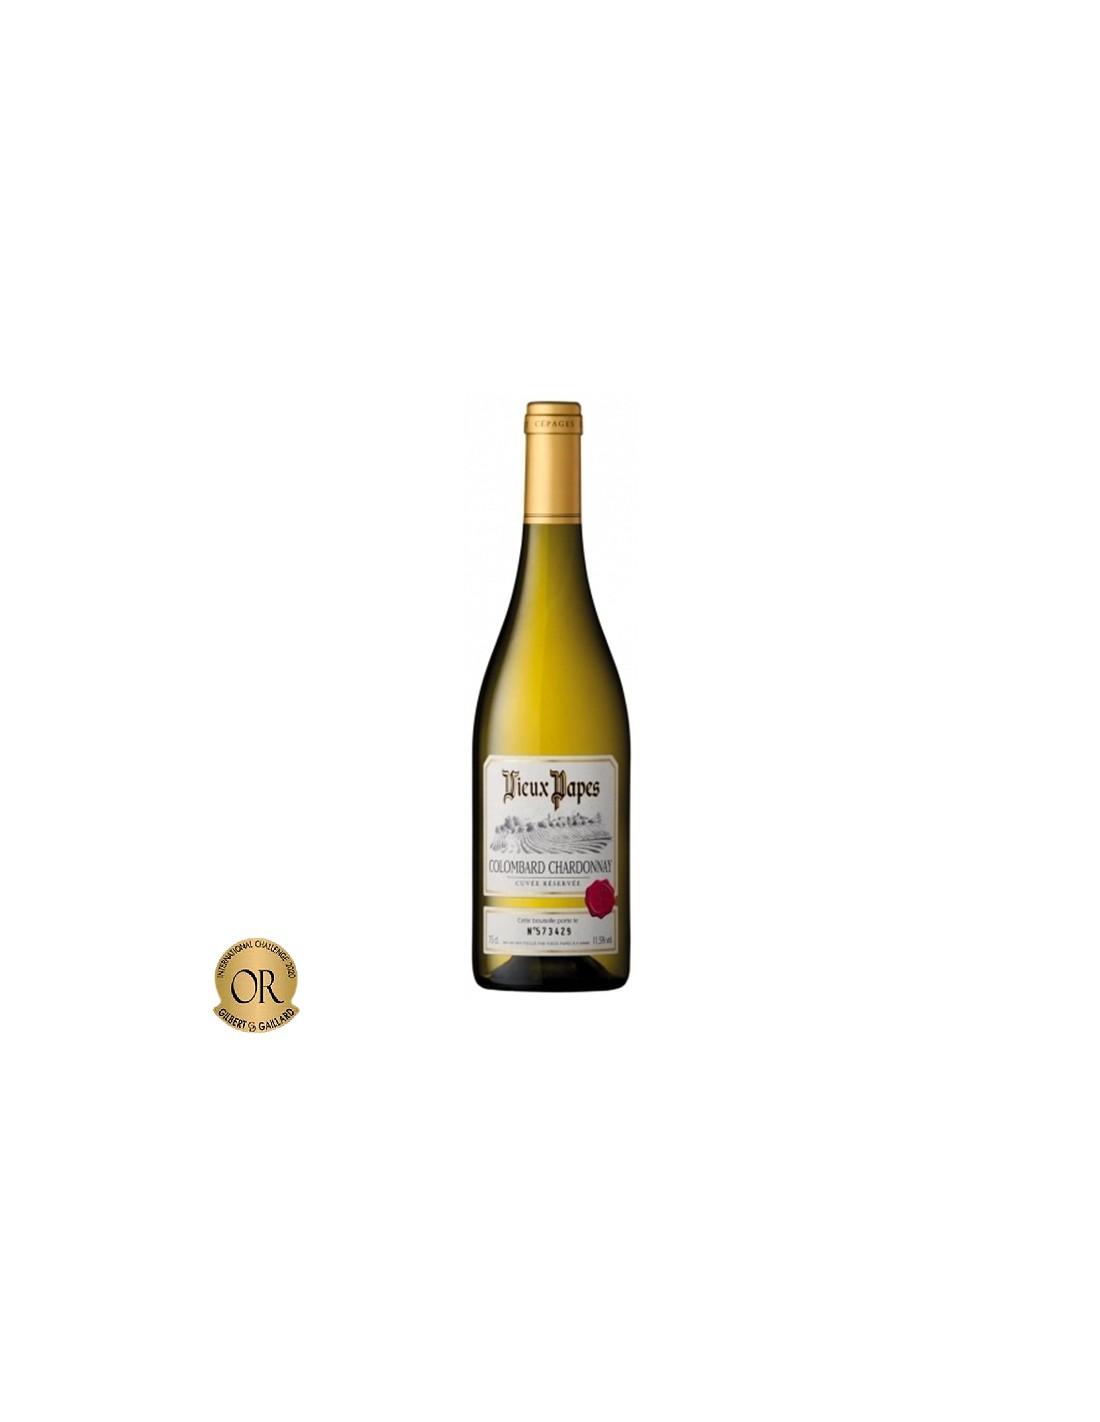 Vin alb, Chardonnay - Colombard, Vieux Papes, 0.75L, 12% alc., Franta